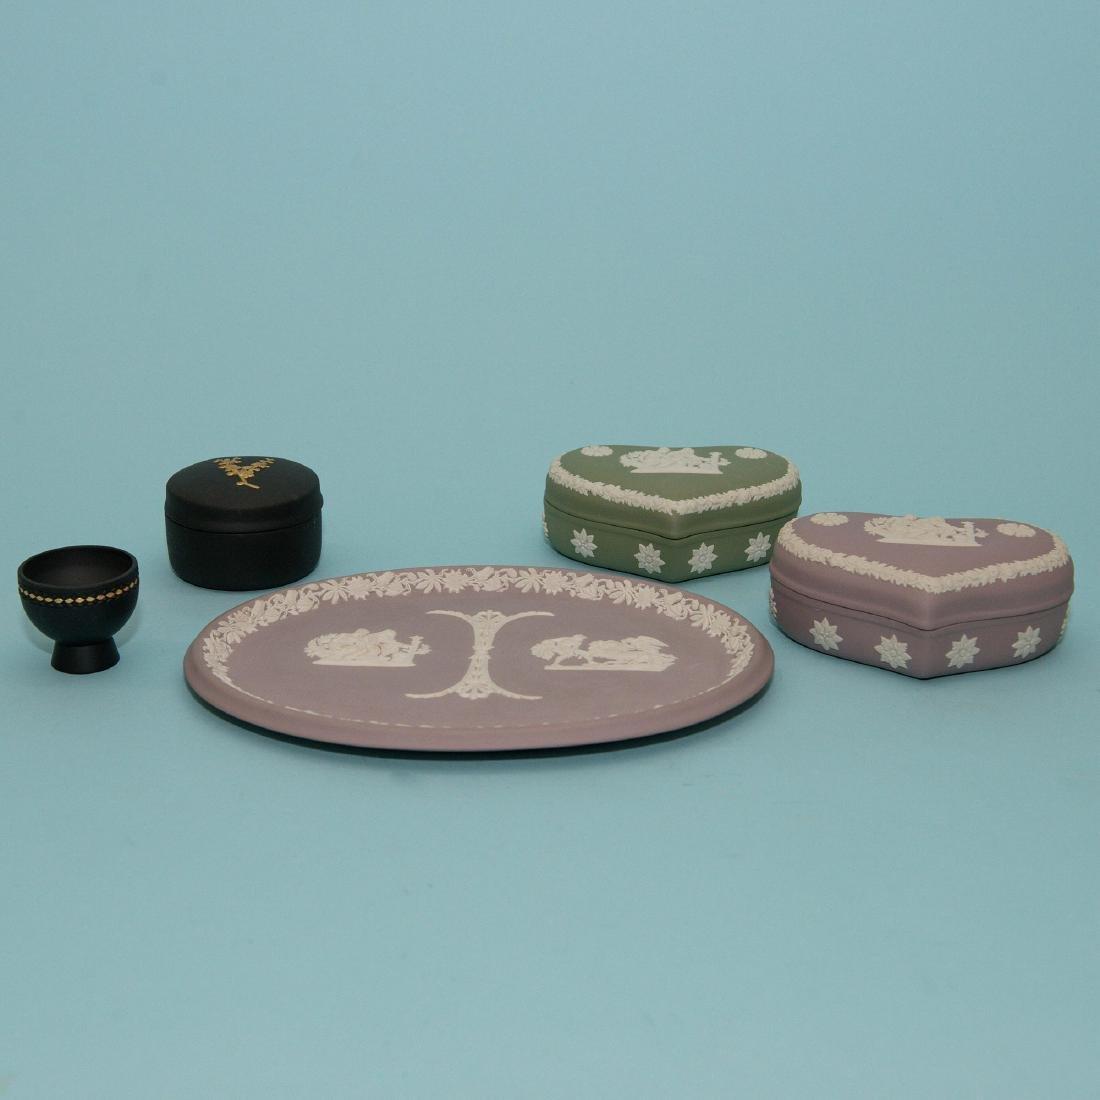 Wedgwood Jasperware 8 piece Collection - 2